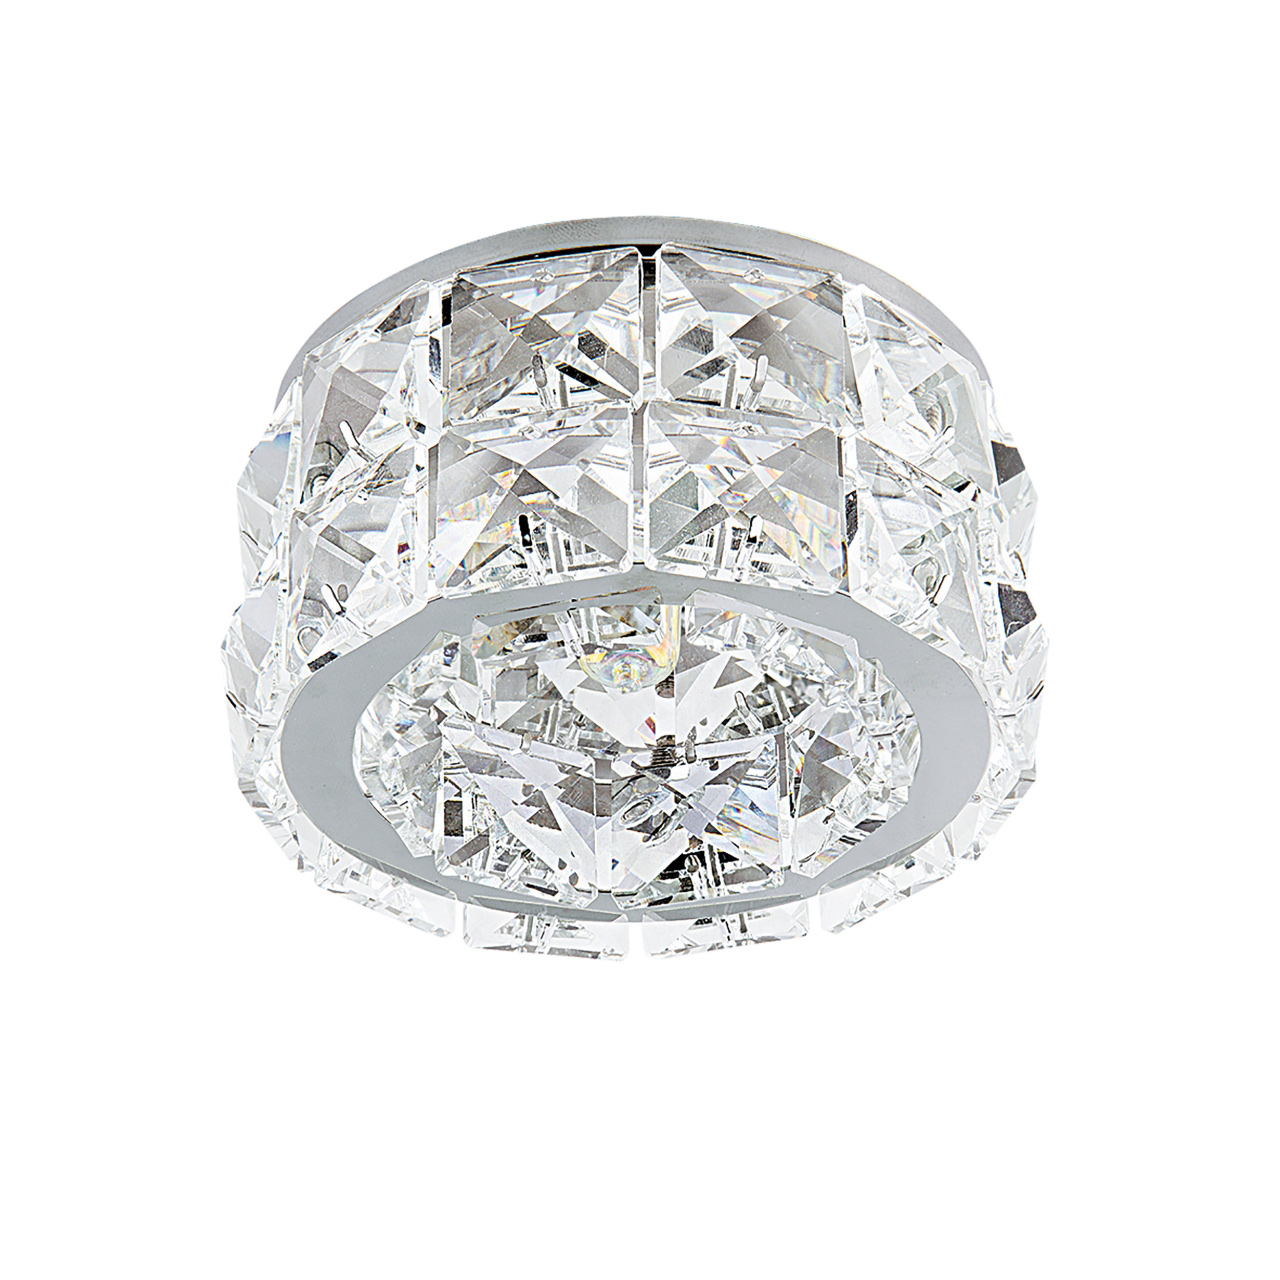 Светильник Onda GR G9 хром / хрусталь прозрачный Lightstar 032804